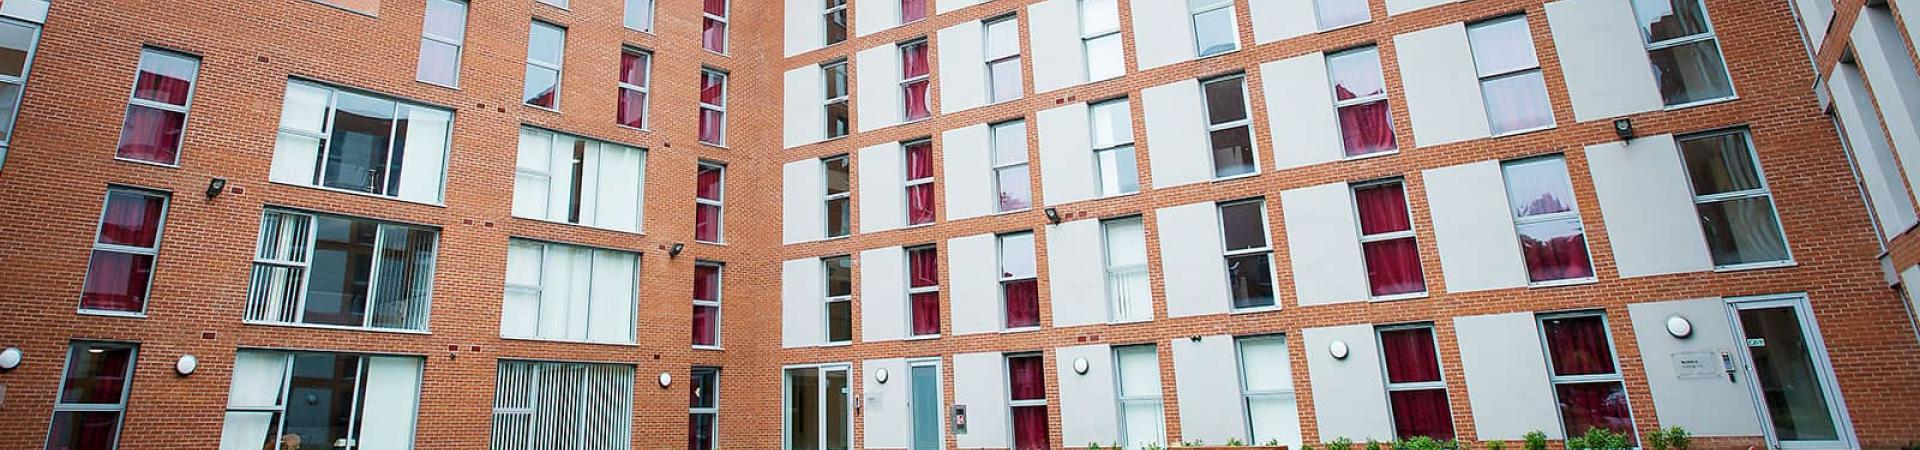 Denmark Road student accommodation, Manchester.